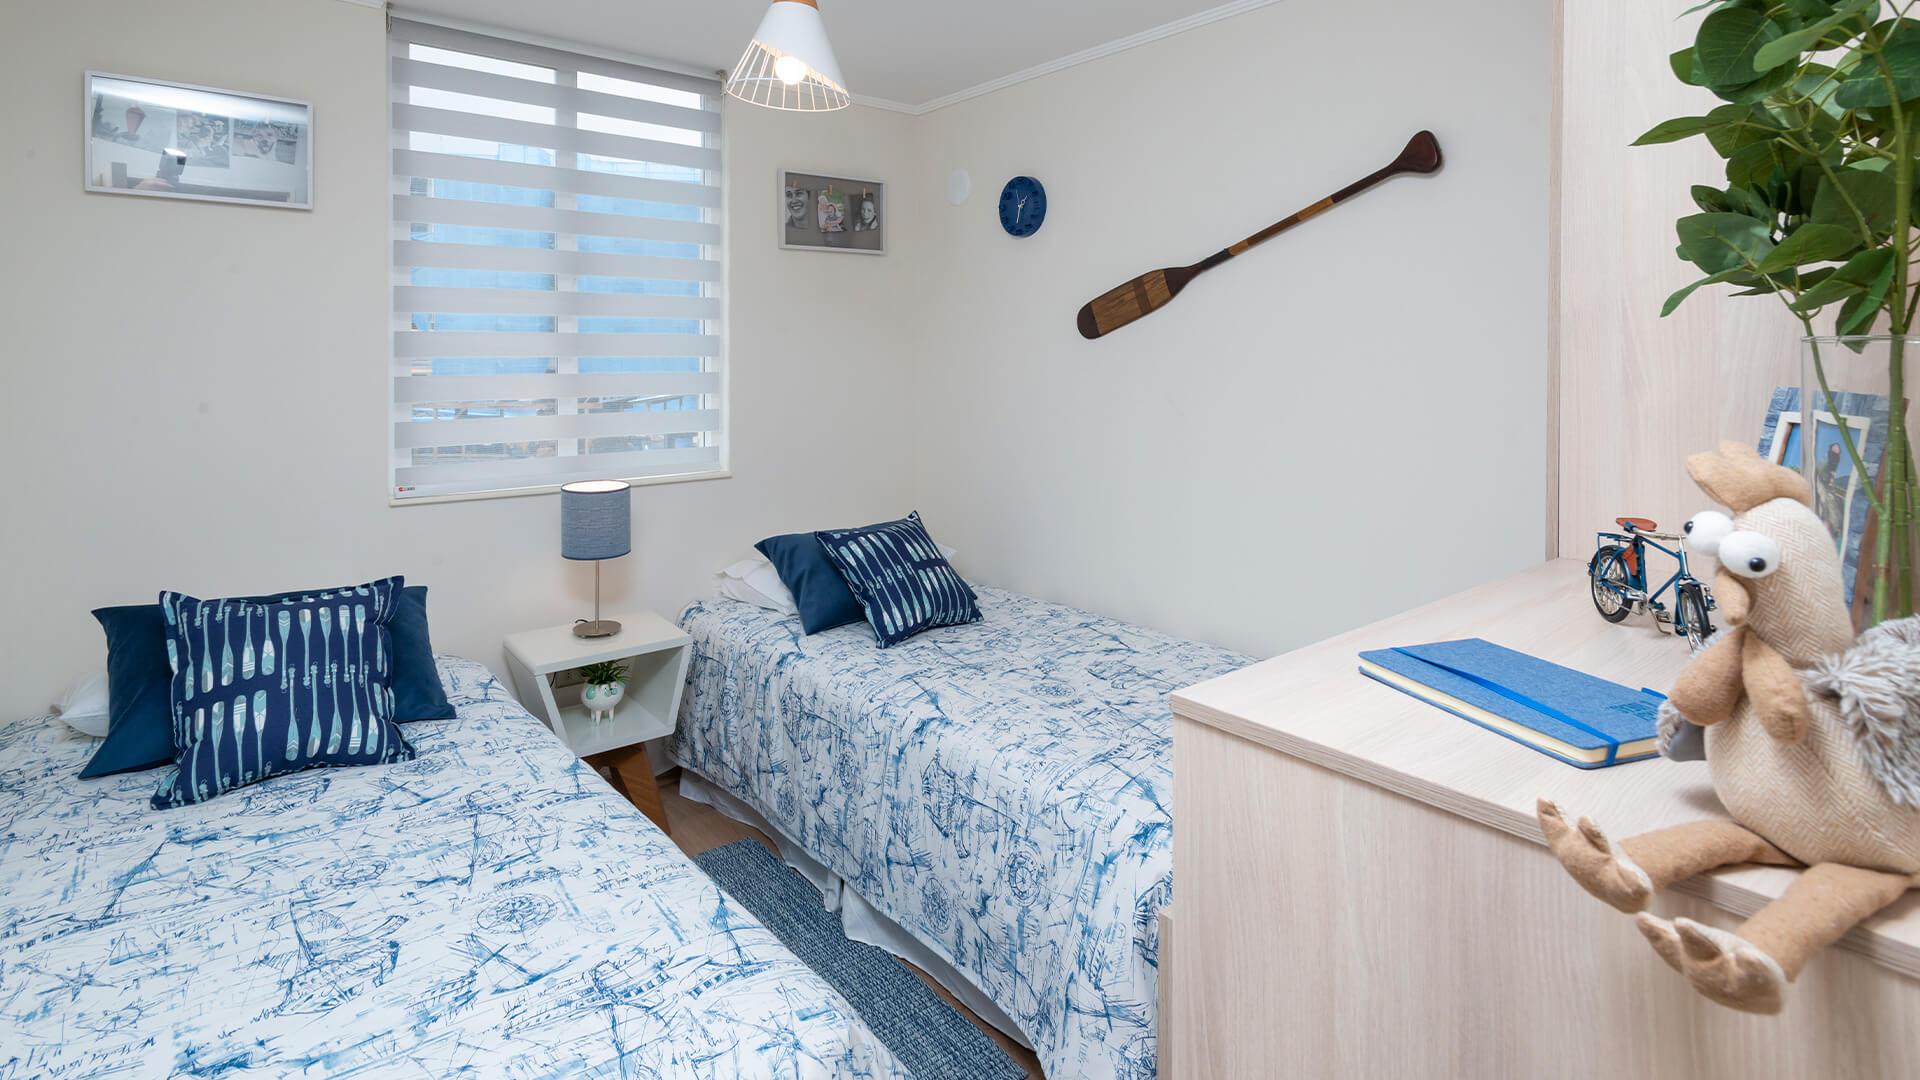 Condominio-Parque-Oriente-dormitorio-doble